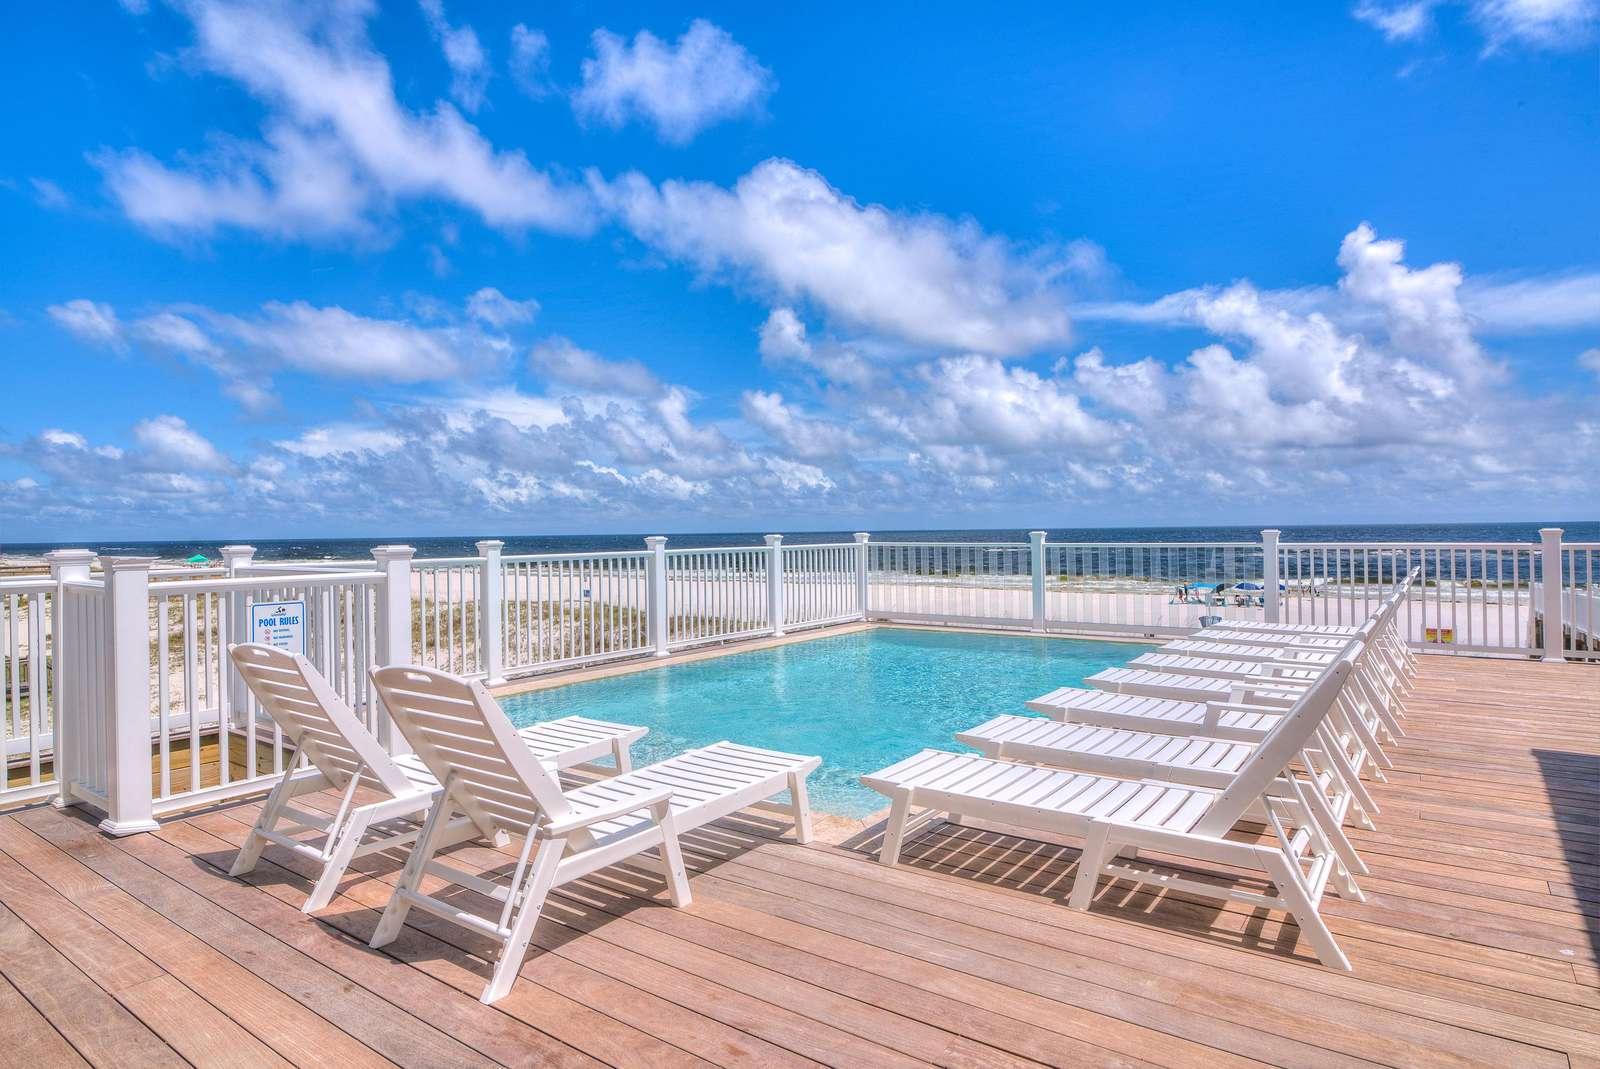 24x15 custom gunite pool- East Pool Deck